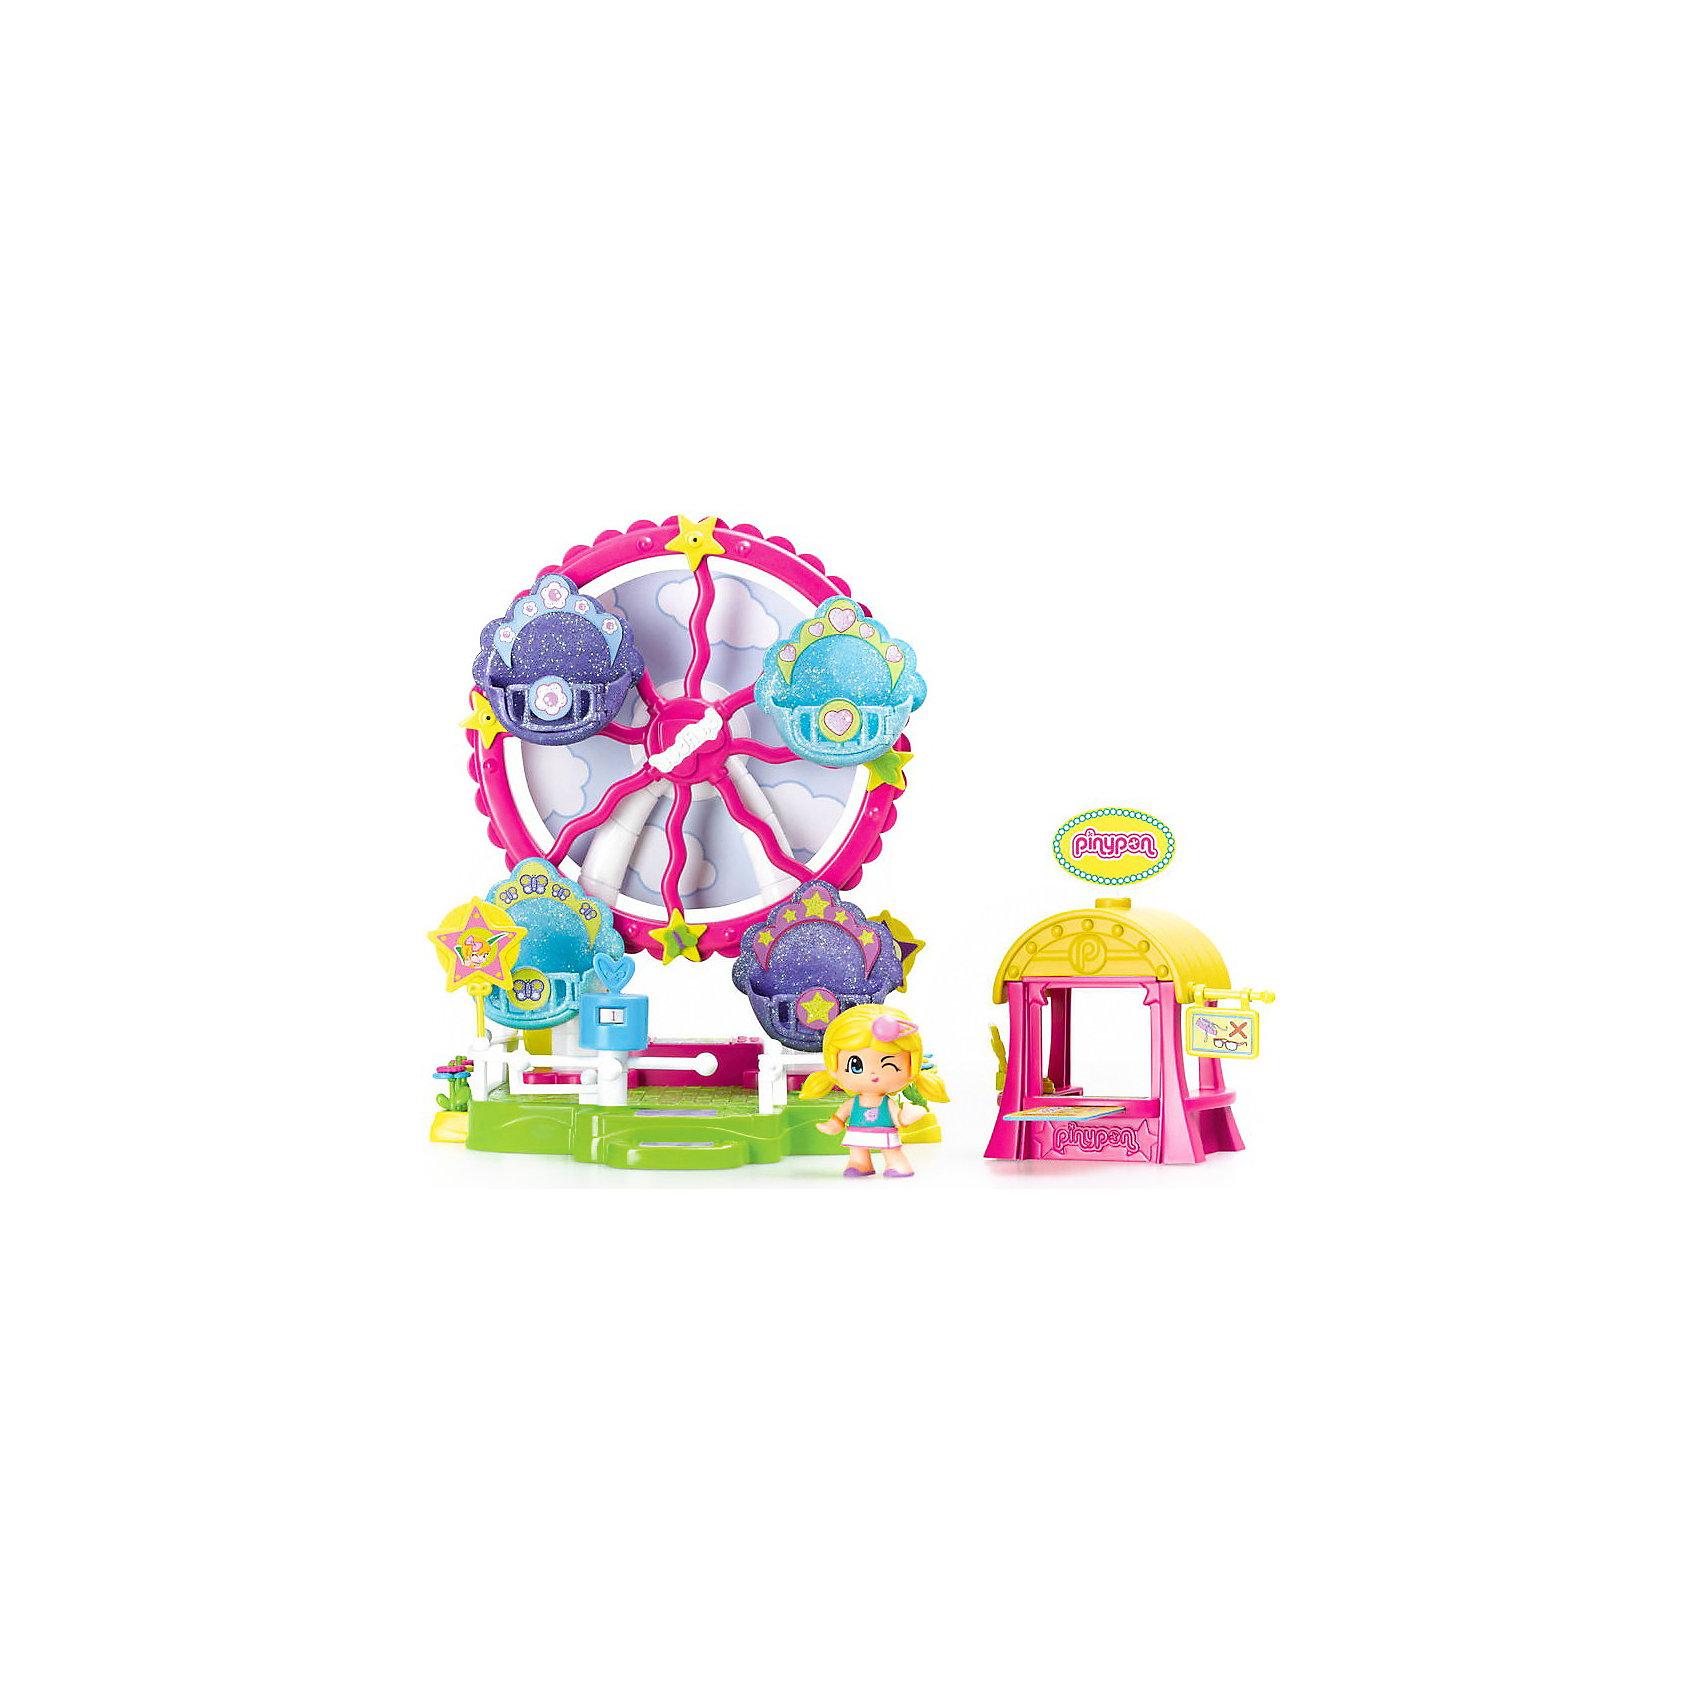 Famosa Игровой набор Пинипон - колесо обозрения, Famosa набор 2 кукол famosa пинипон чемпионы аксесс 2 в ассорт